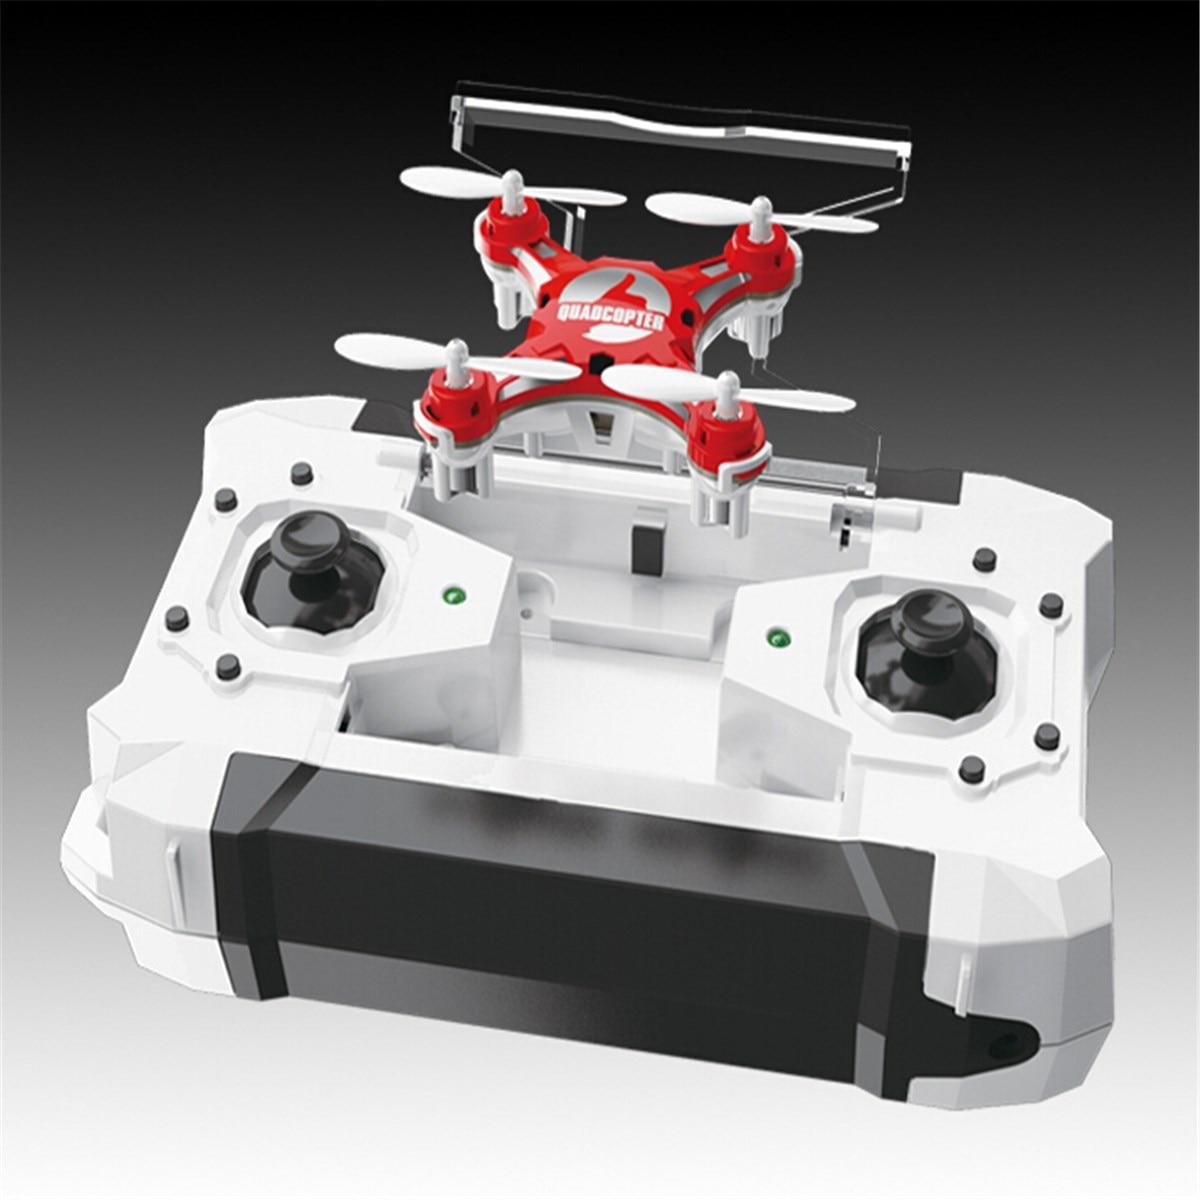 Quadcopter مع هليكوبتر Dollar